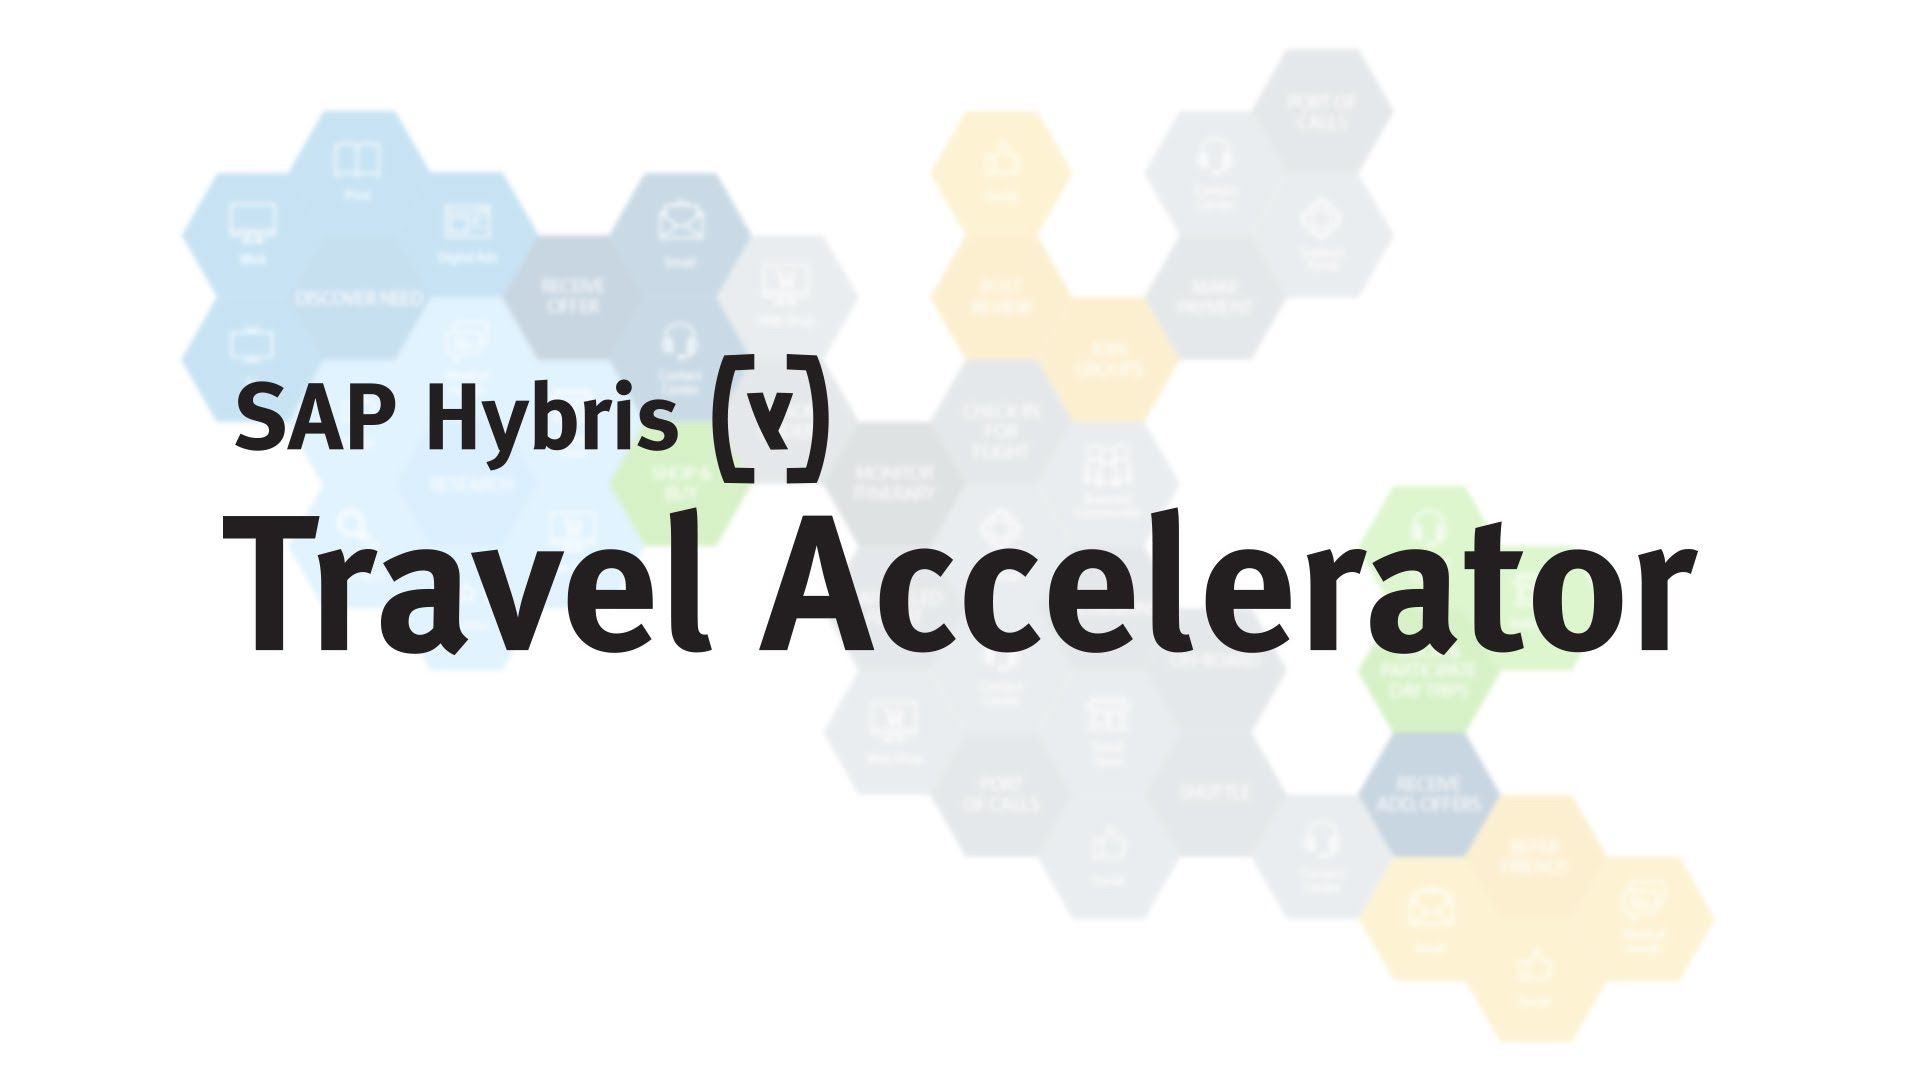 SAP Hybris Travel Accelerator